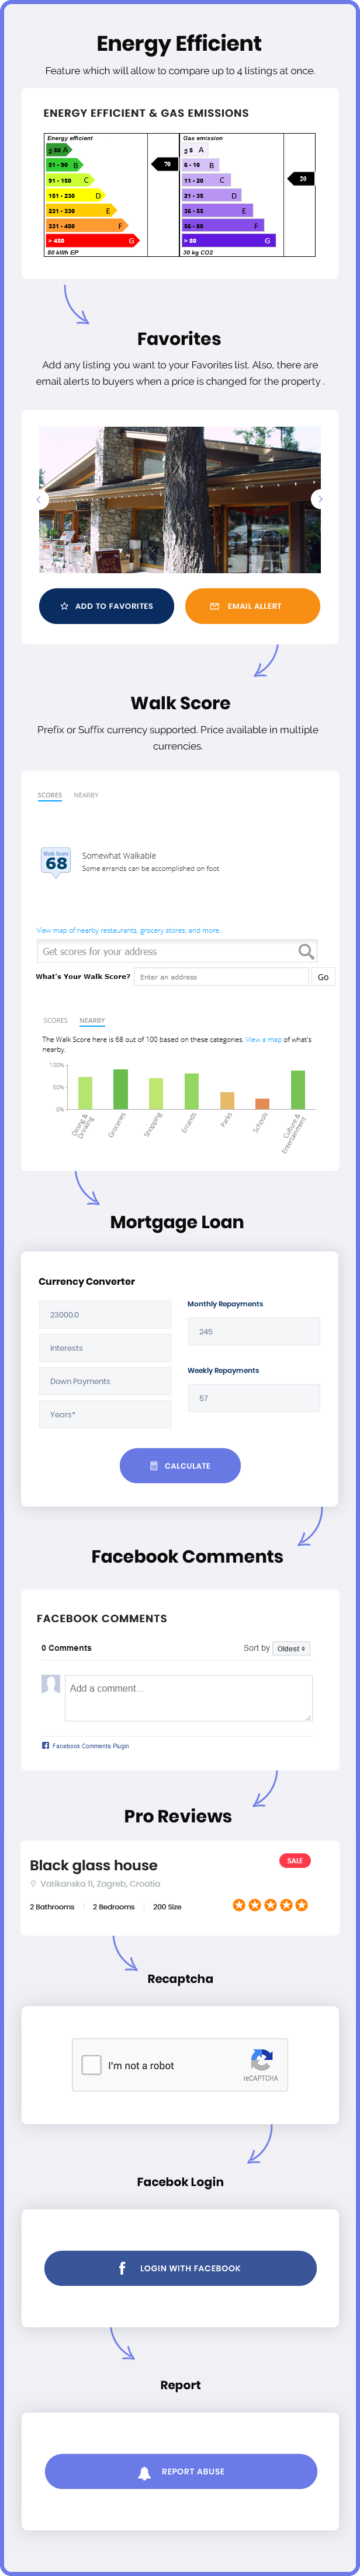 Real Estate Agency Portal - 9